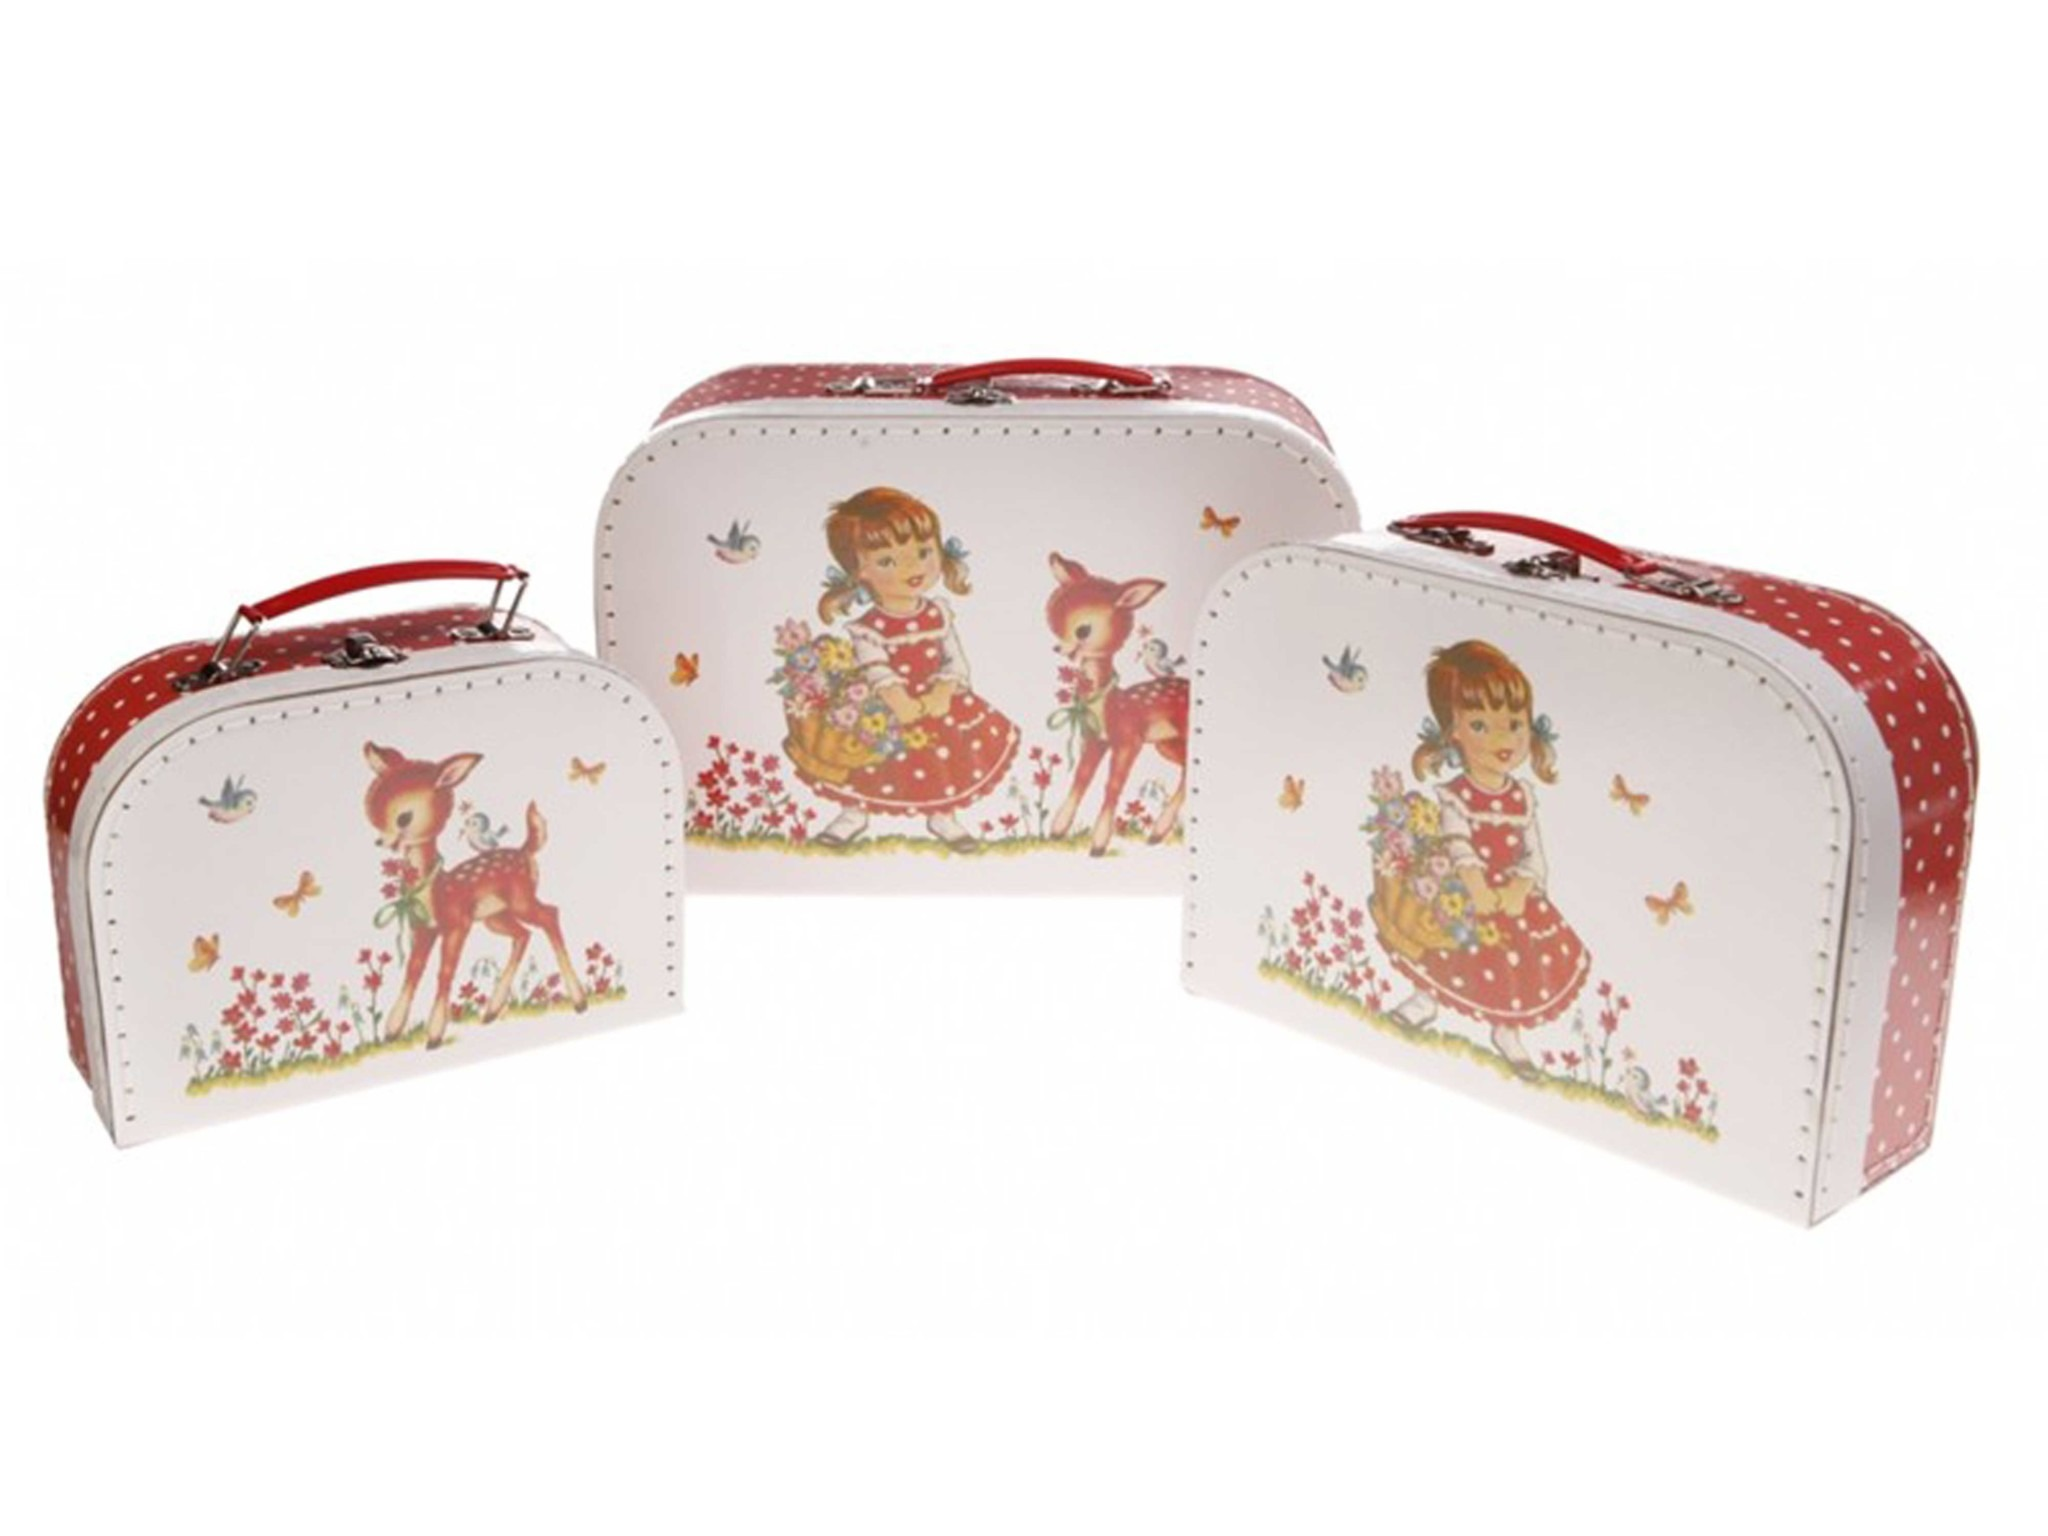 3-delige kofferset - Heidi